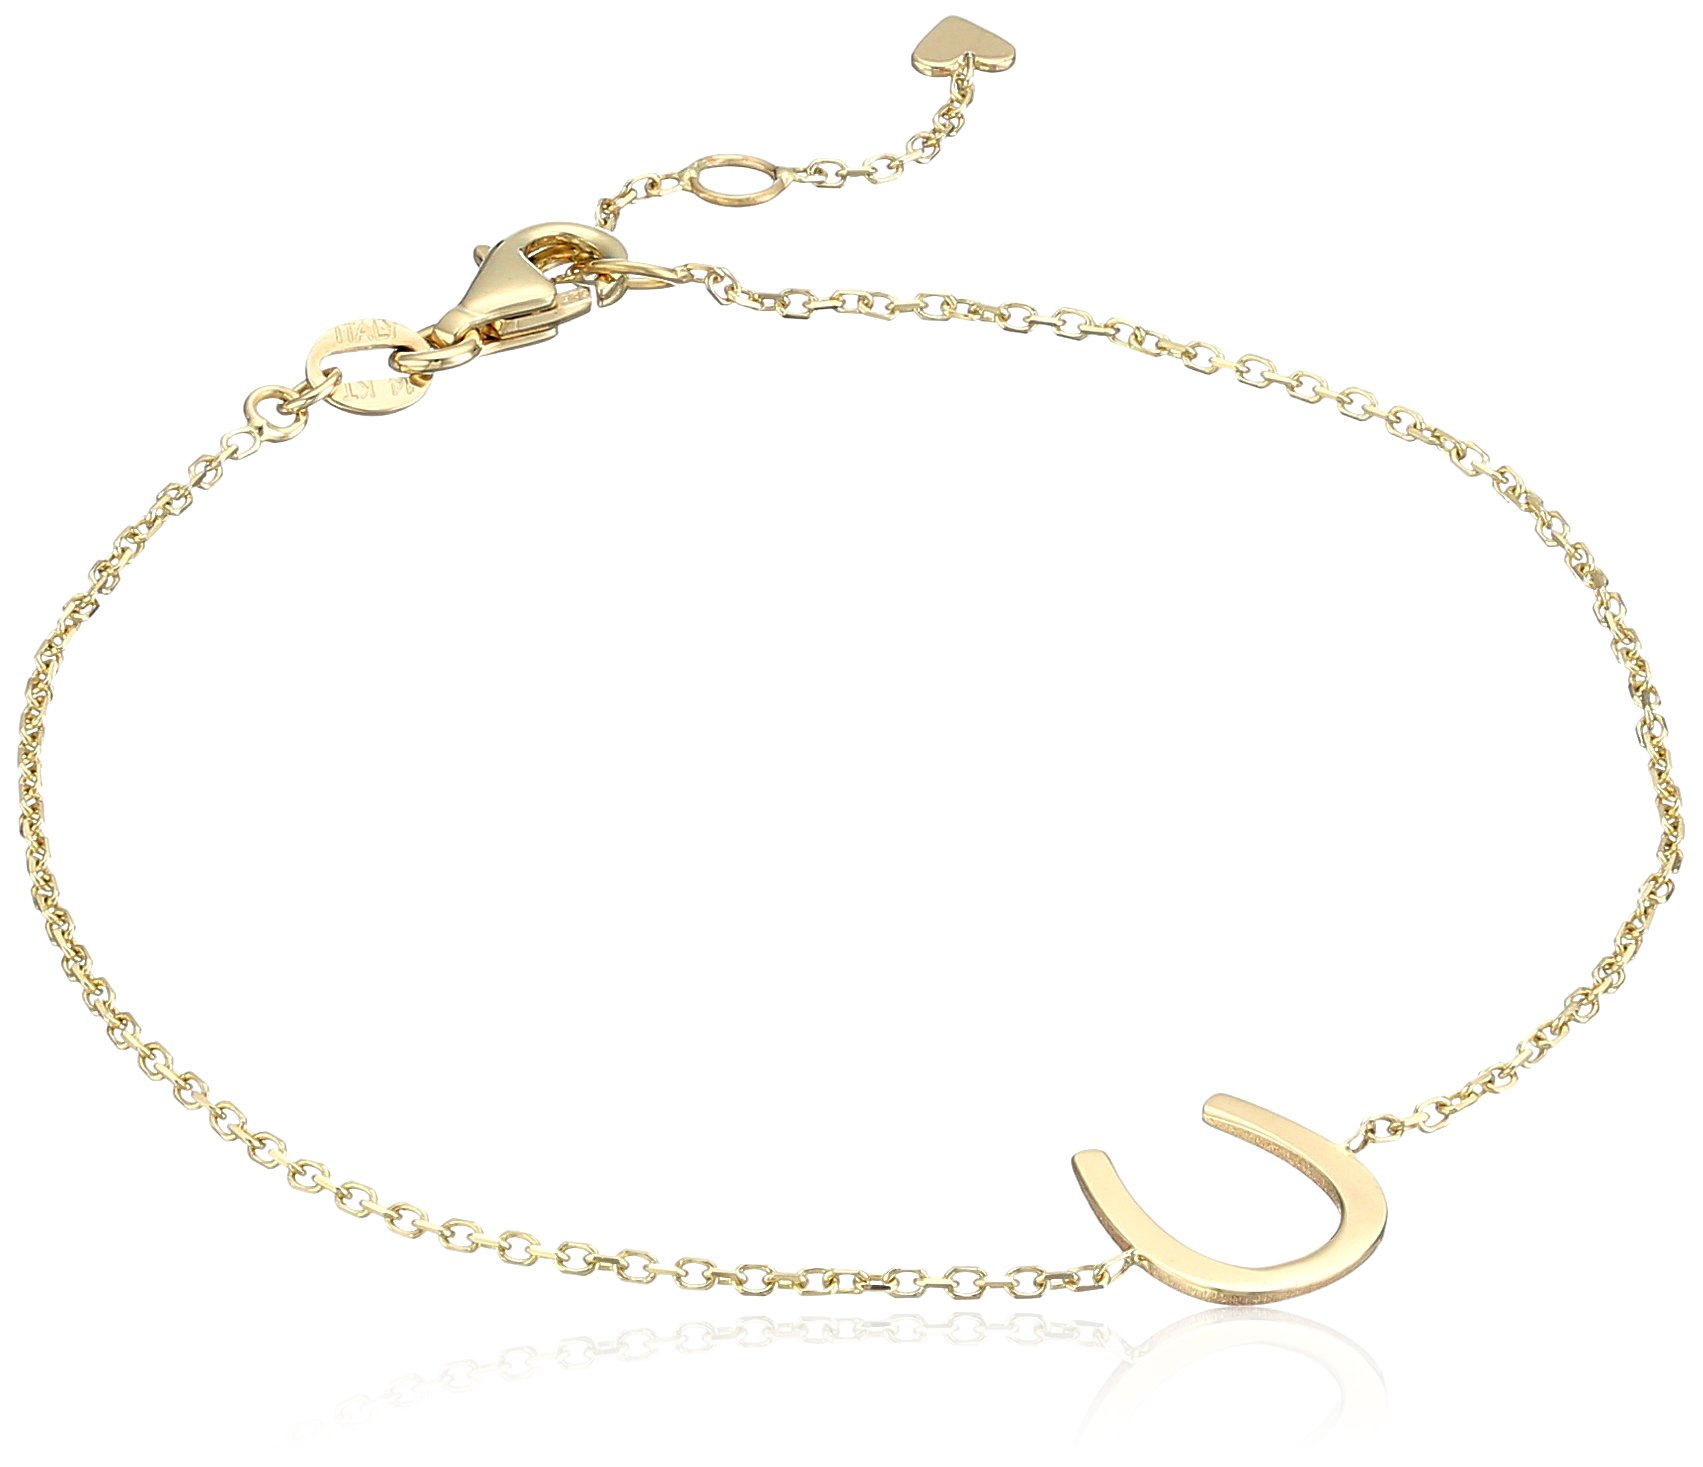 14k Italian Yellow Gold Horseshoe Charm Bracelet, Adjustable 6.5'' to 7''